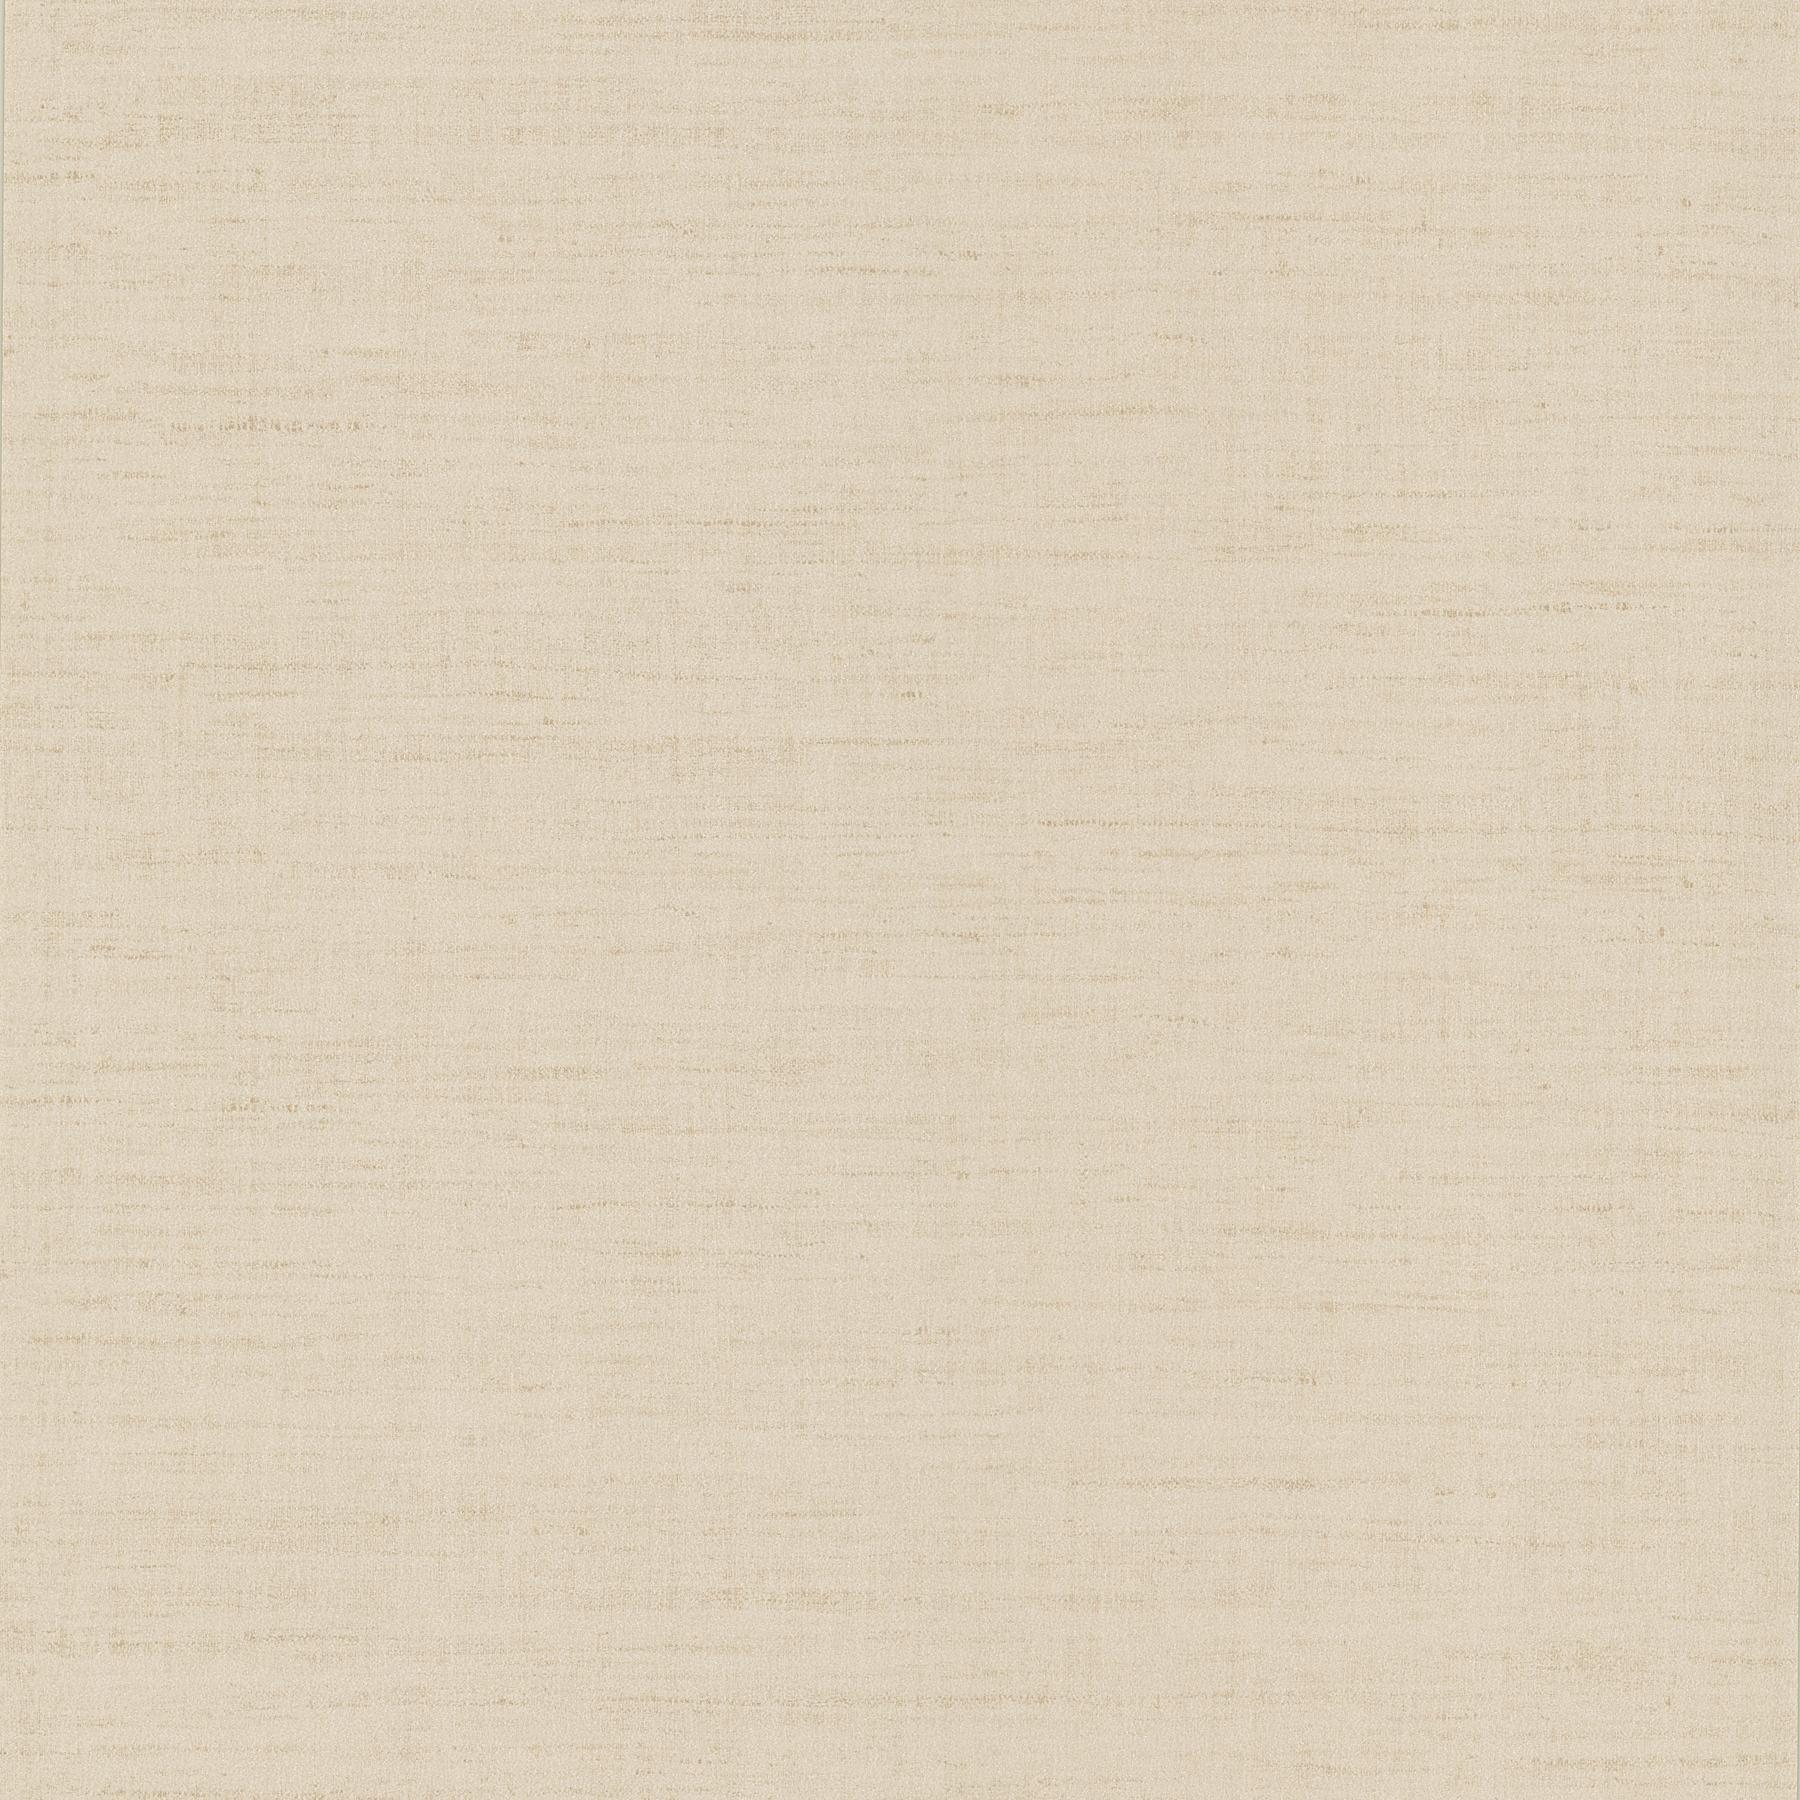 Brewster Wallcovering Seda Beige Silk Texture Wallpaper